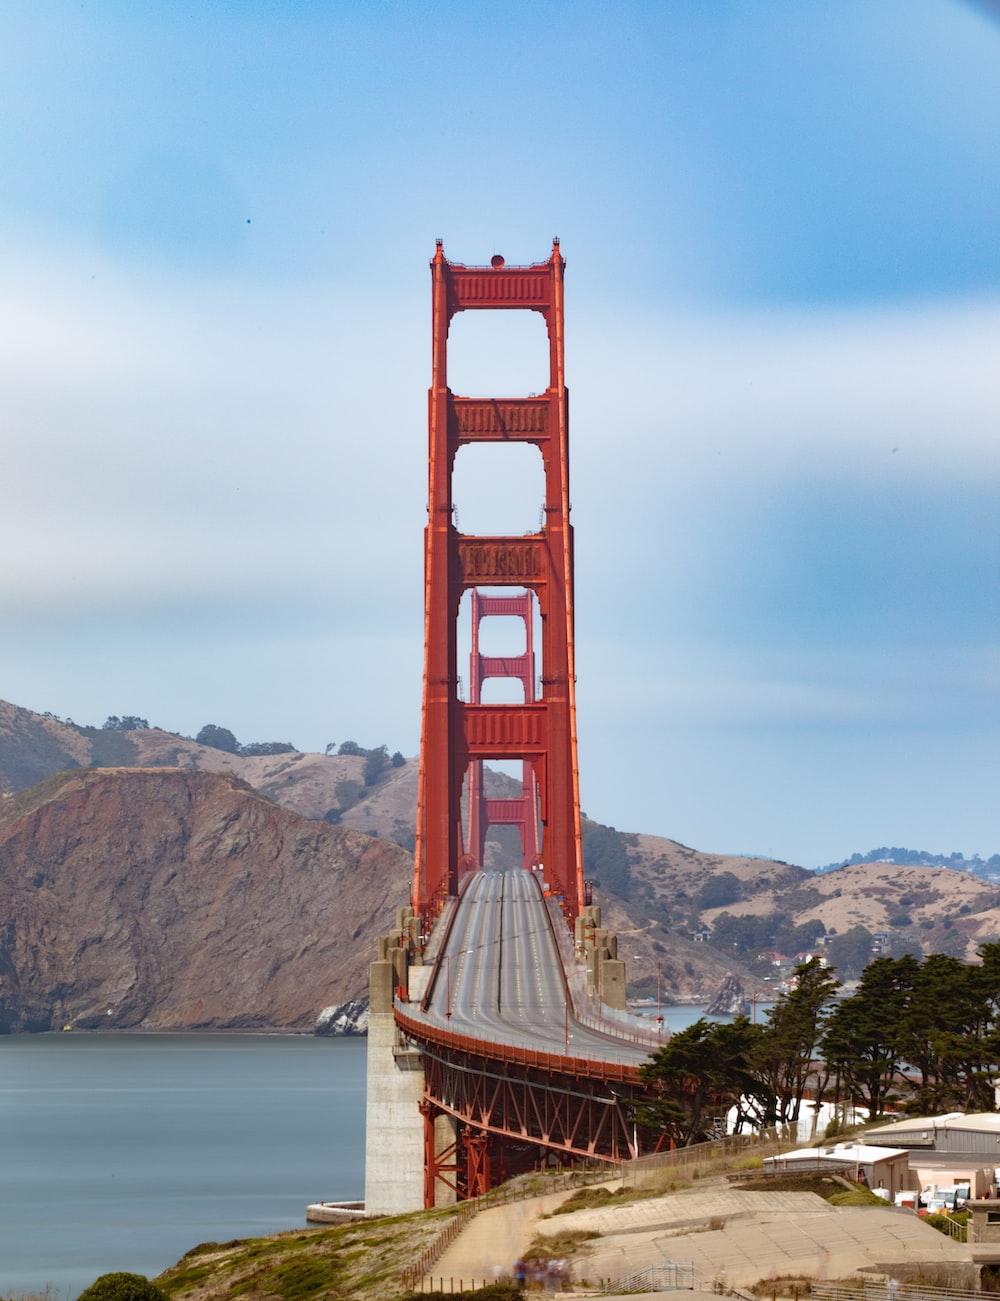 Golden Gate Bridge under blue clear sky